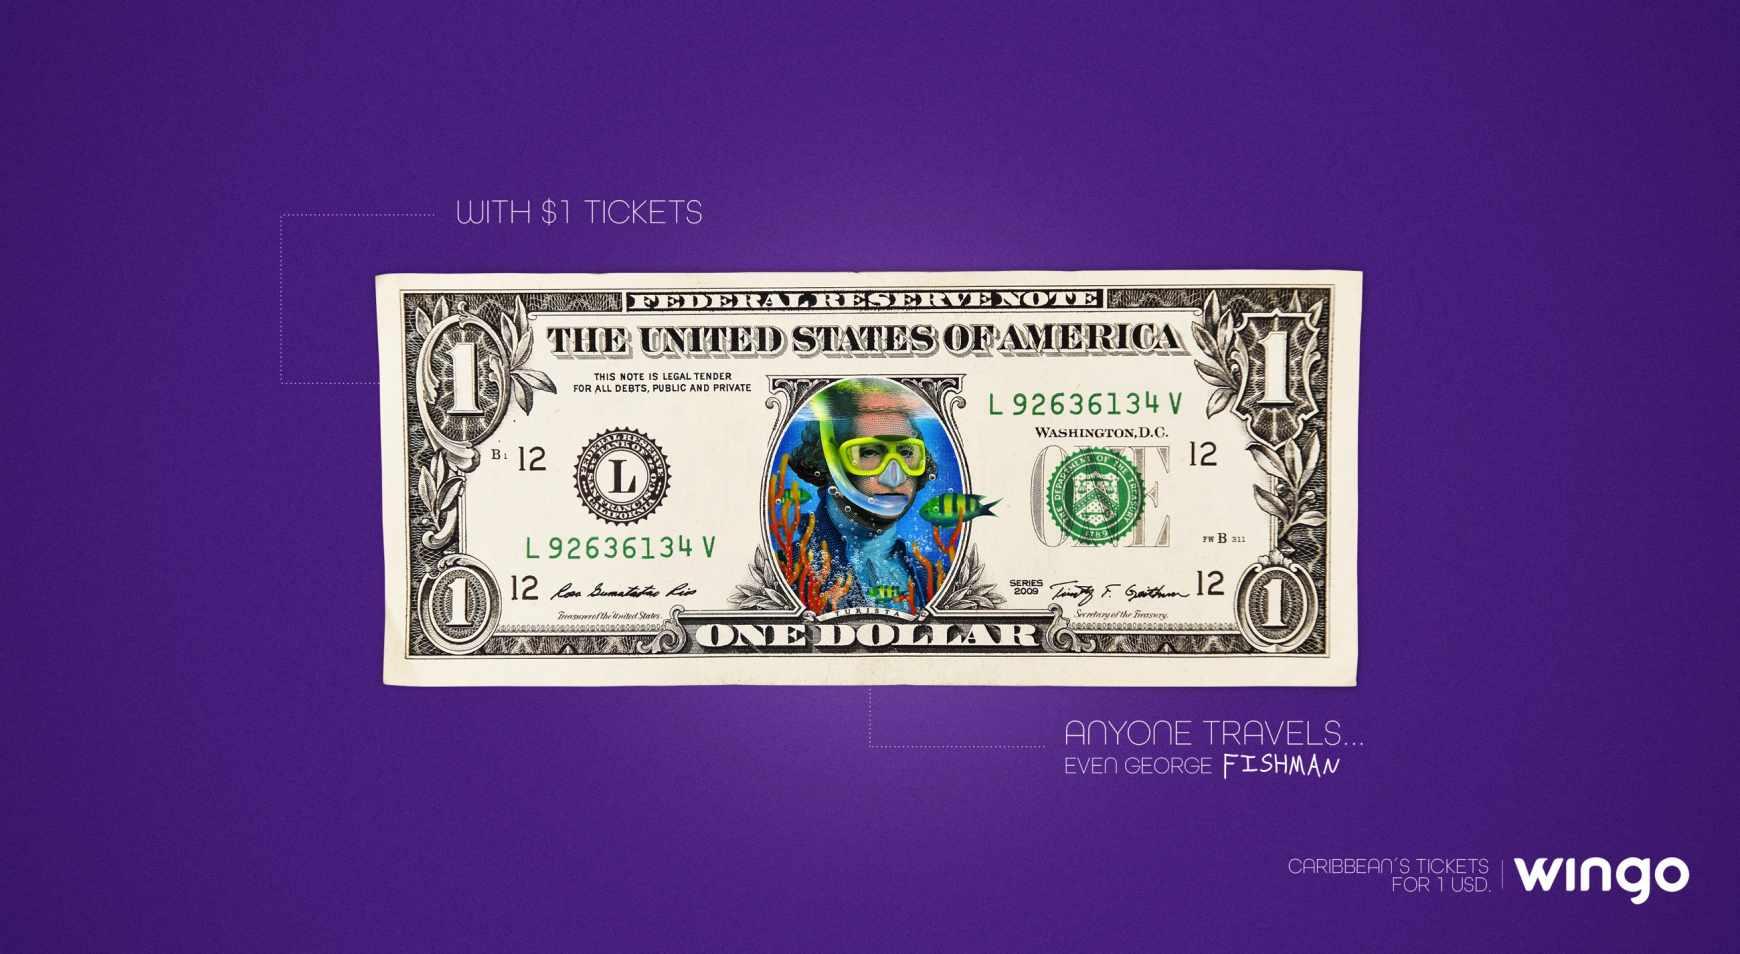 Wingo Print Ad - 1 Dollar Tickets, George Fishman